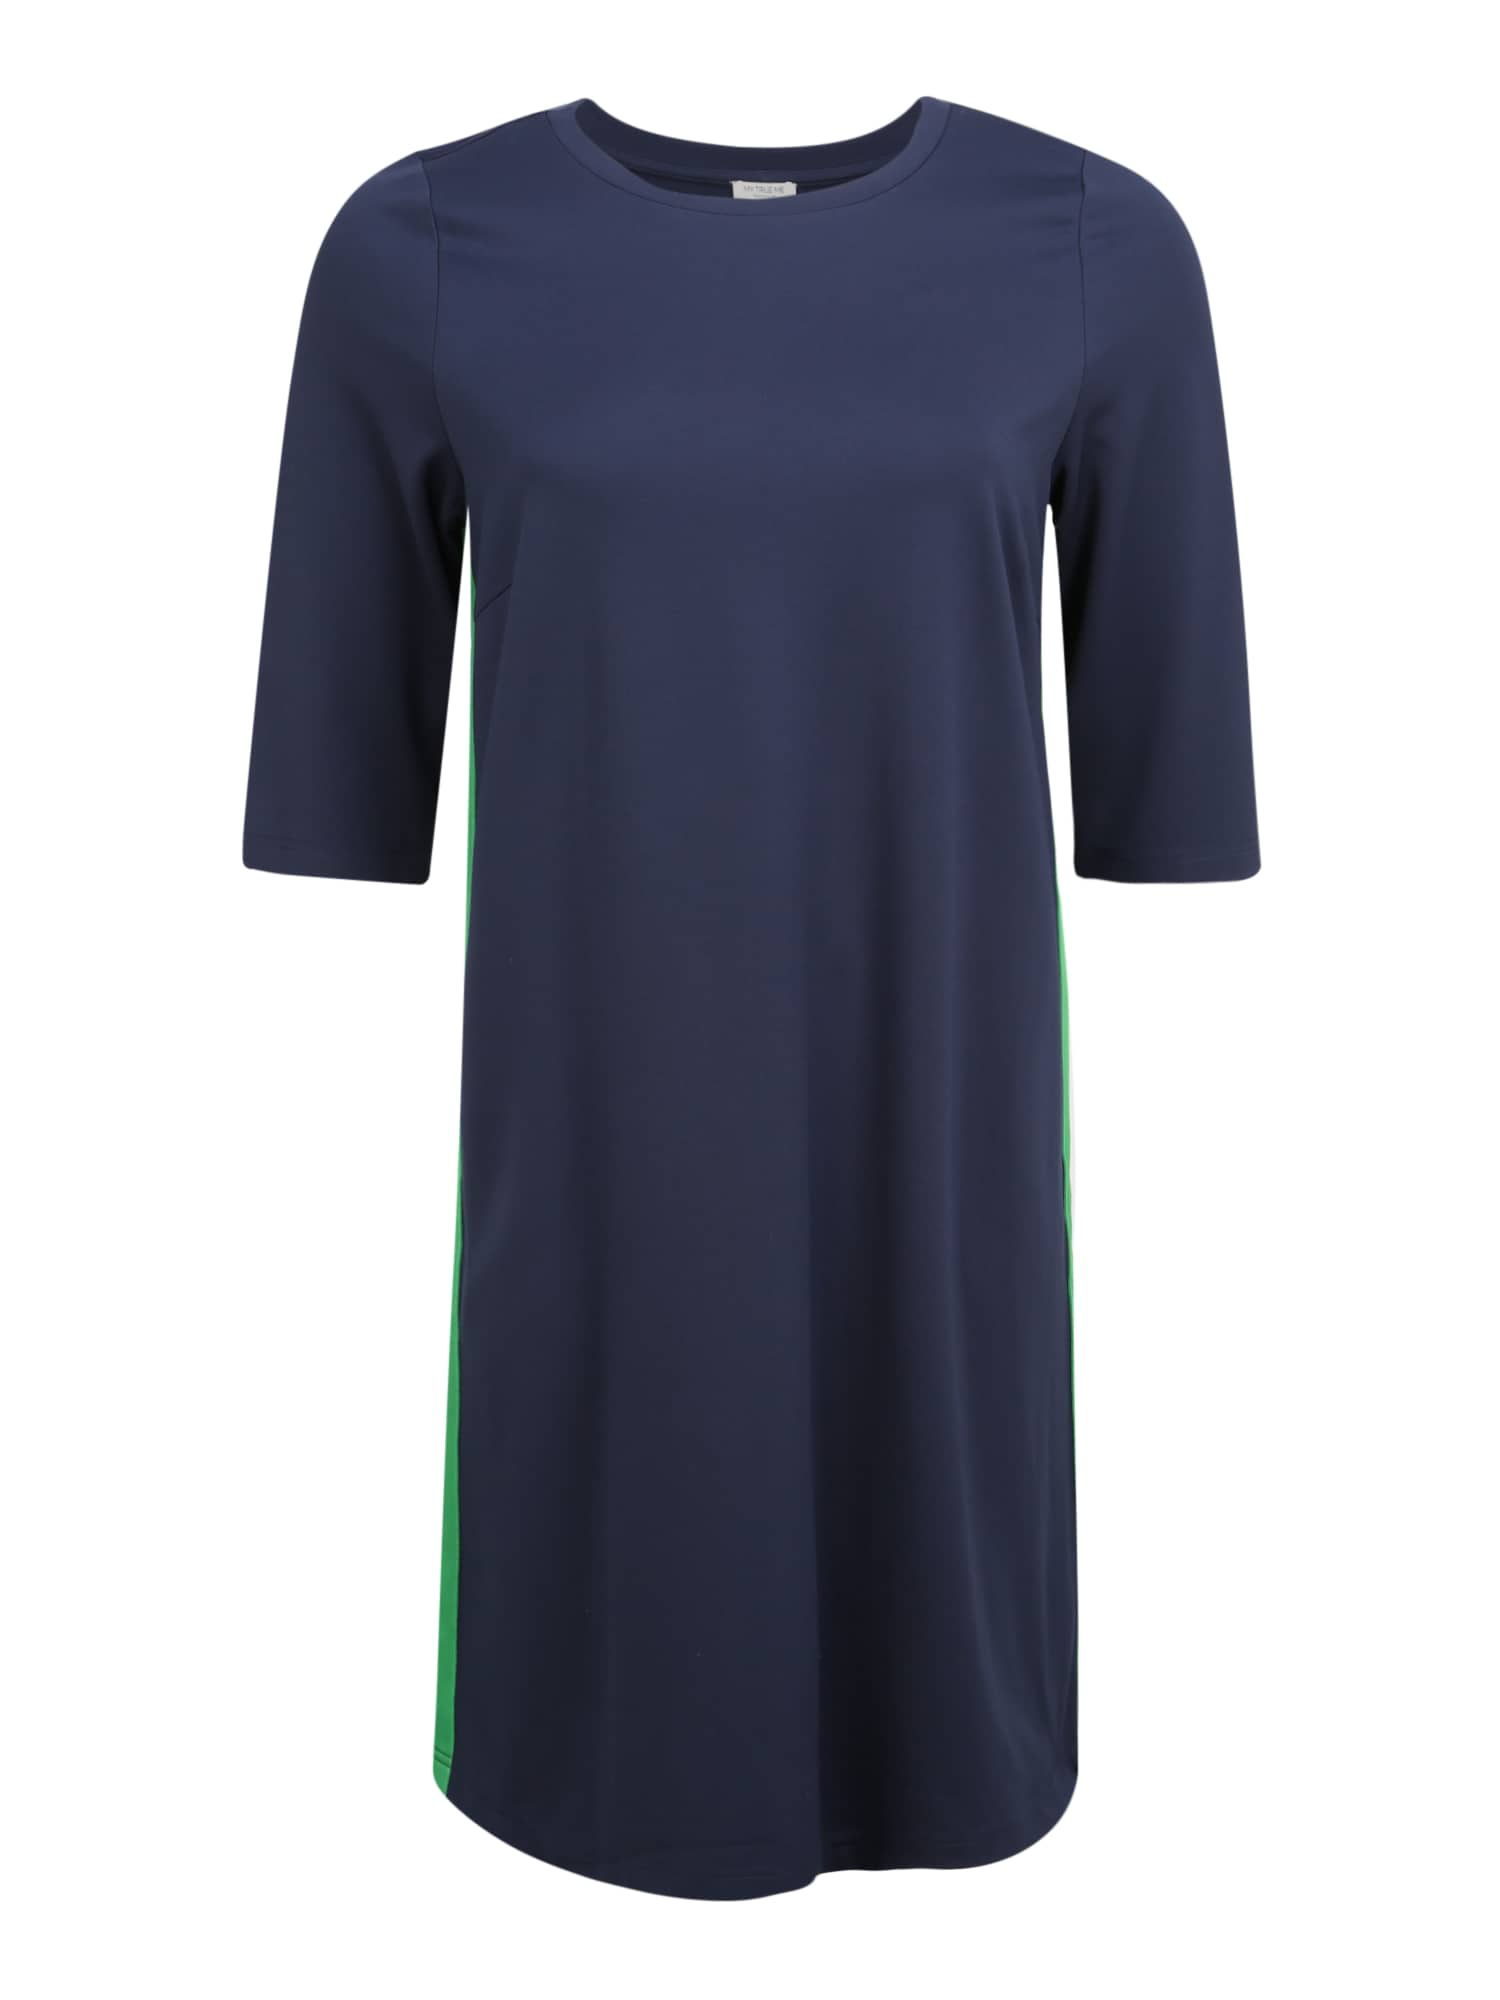 MY TRUE ME Suknelė 'Shift' tamsiai mėlyna